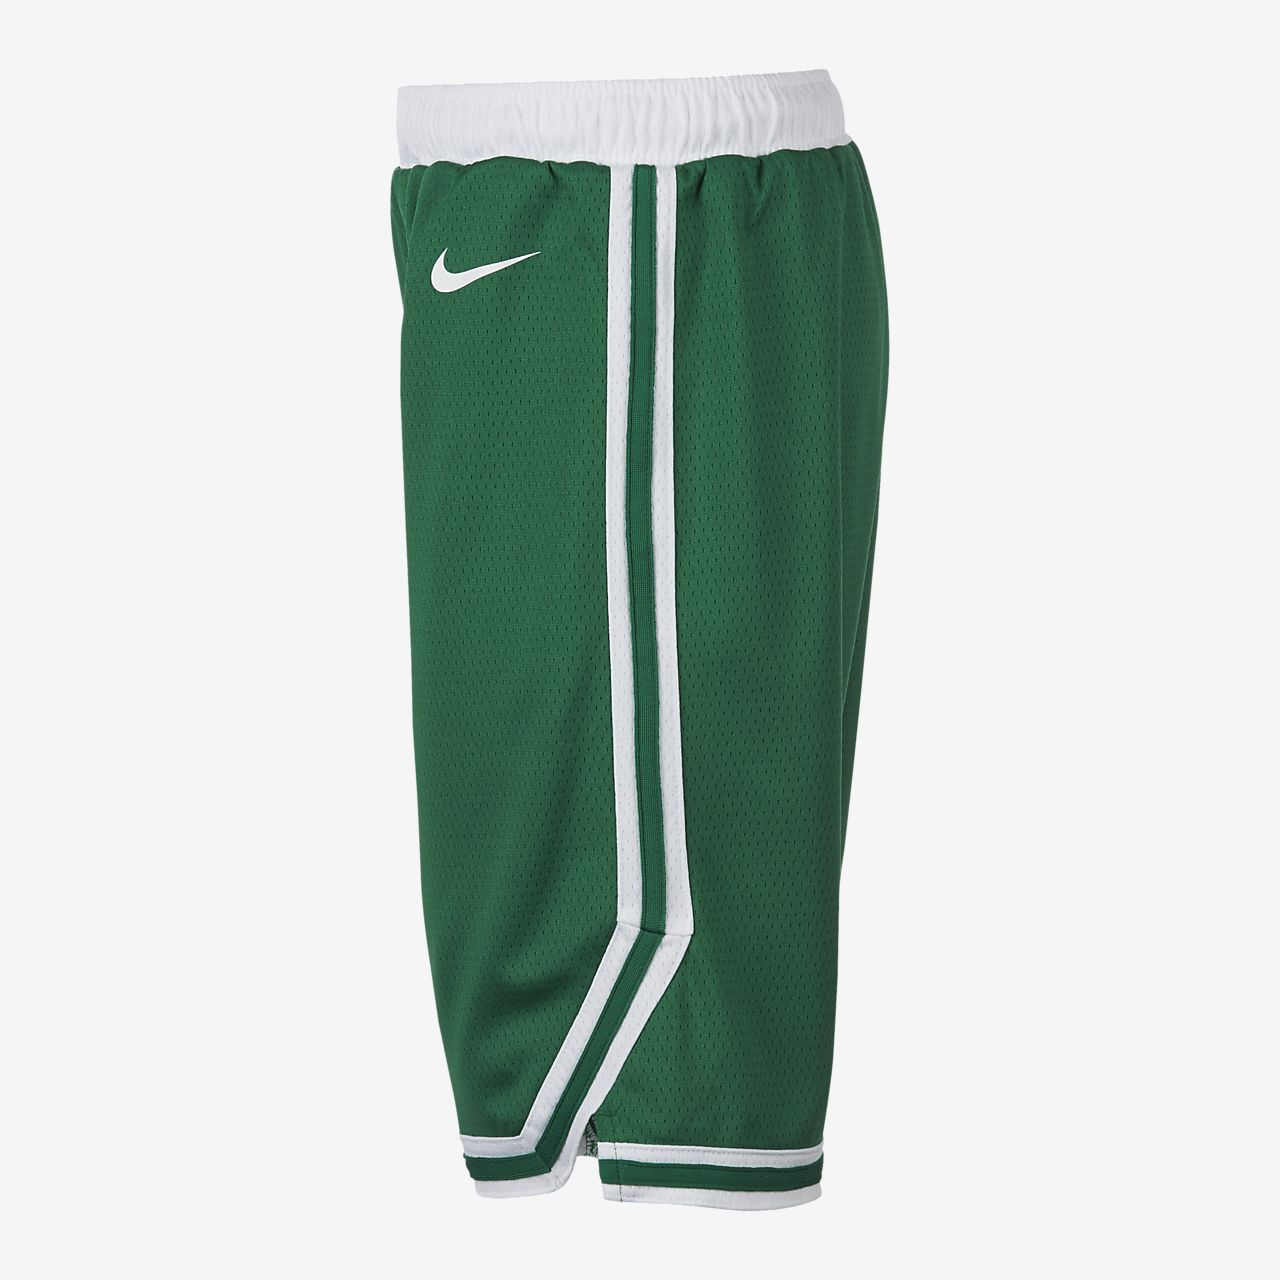 4d6e40ab8de ... Boston Celtics Nike Icon Edition Swingman Big Kids  (Boys ) NBA Shorts